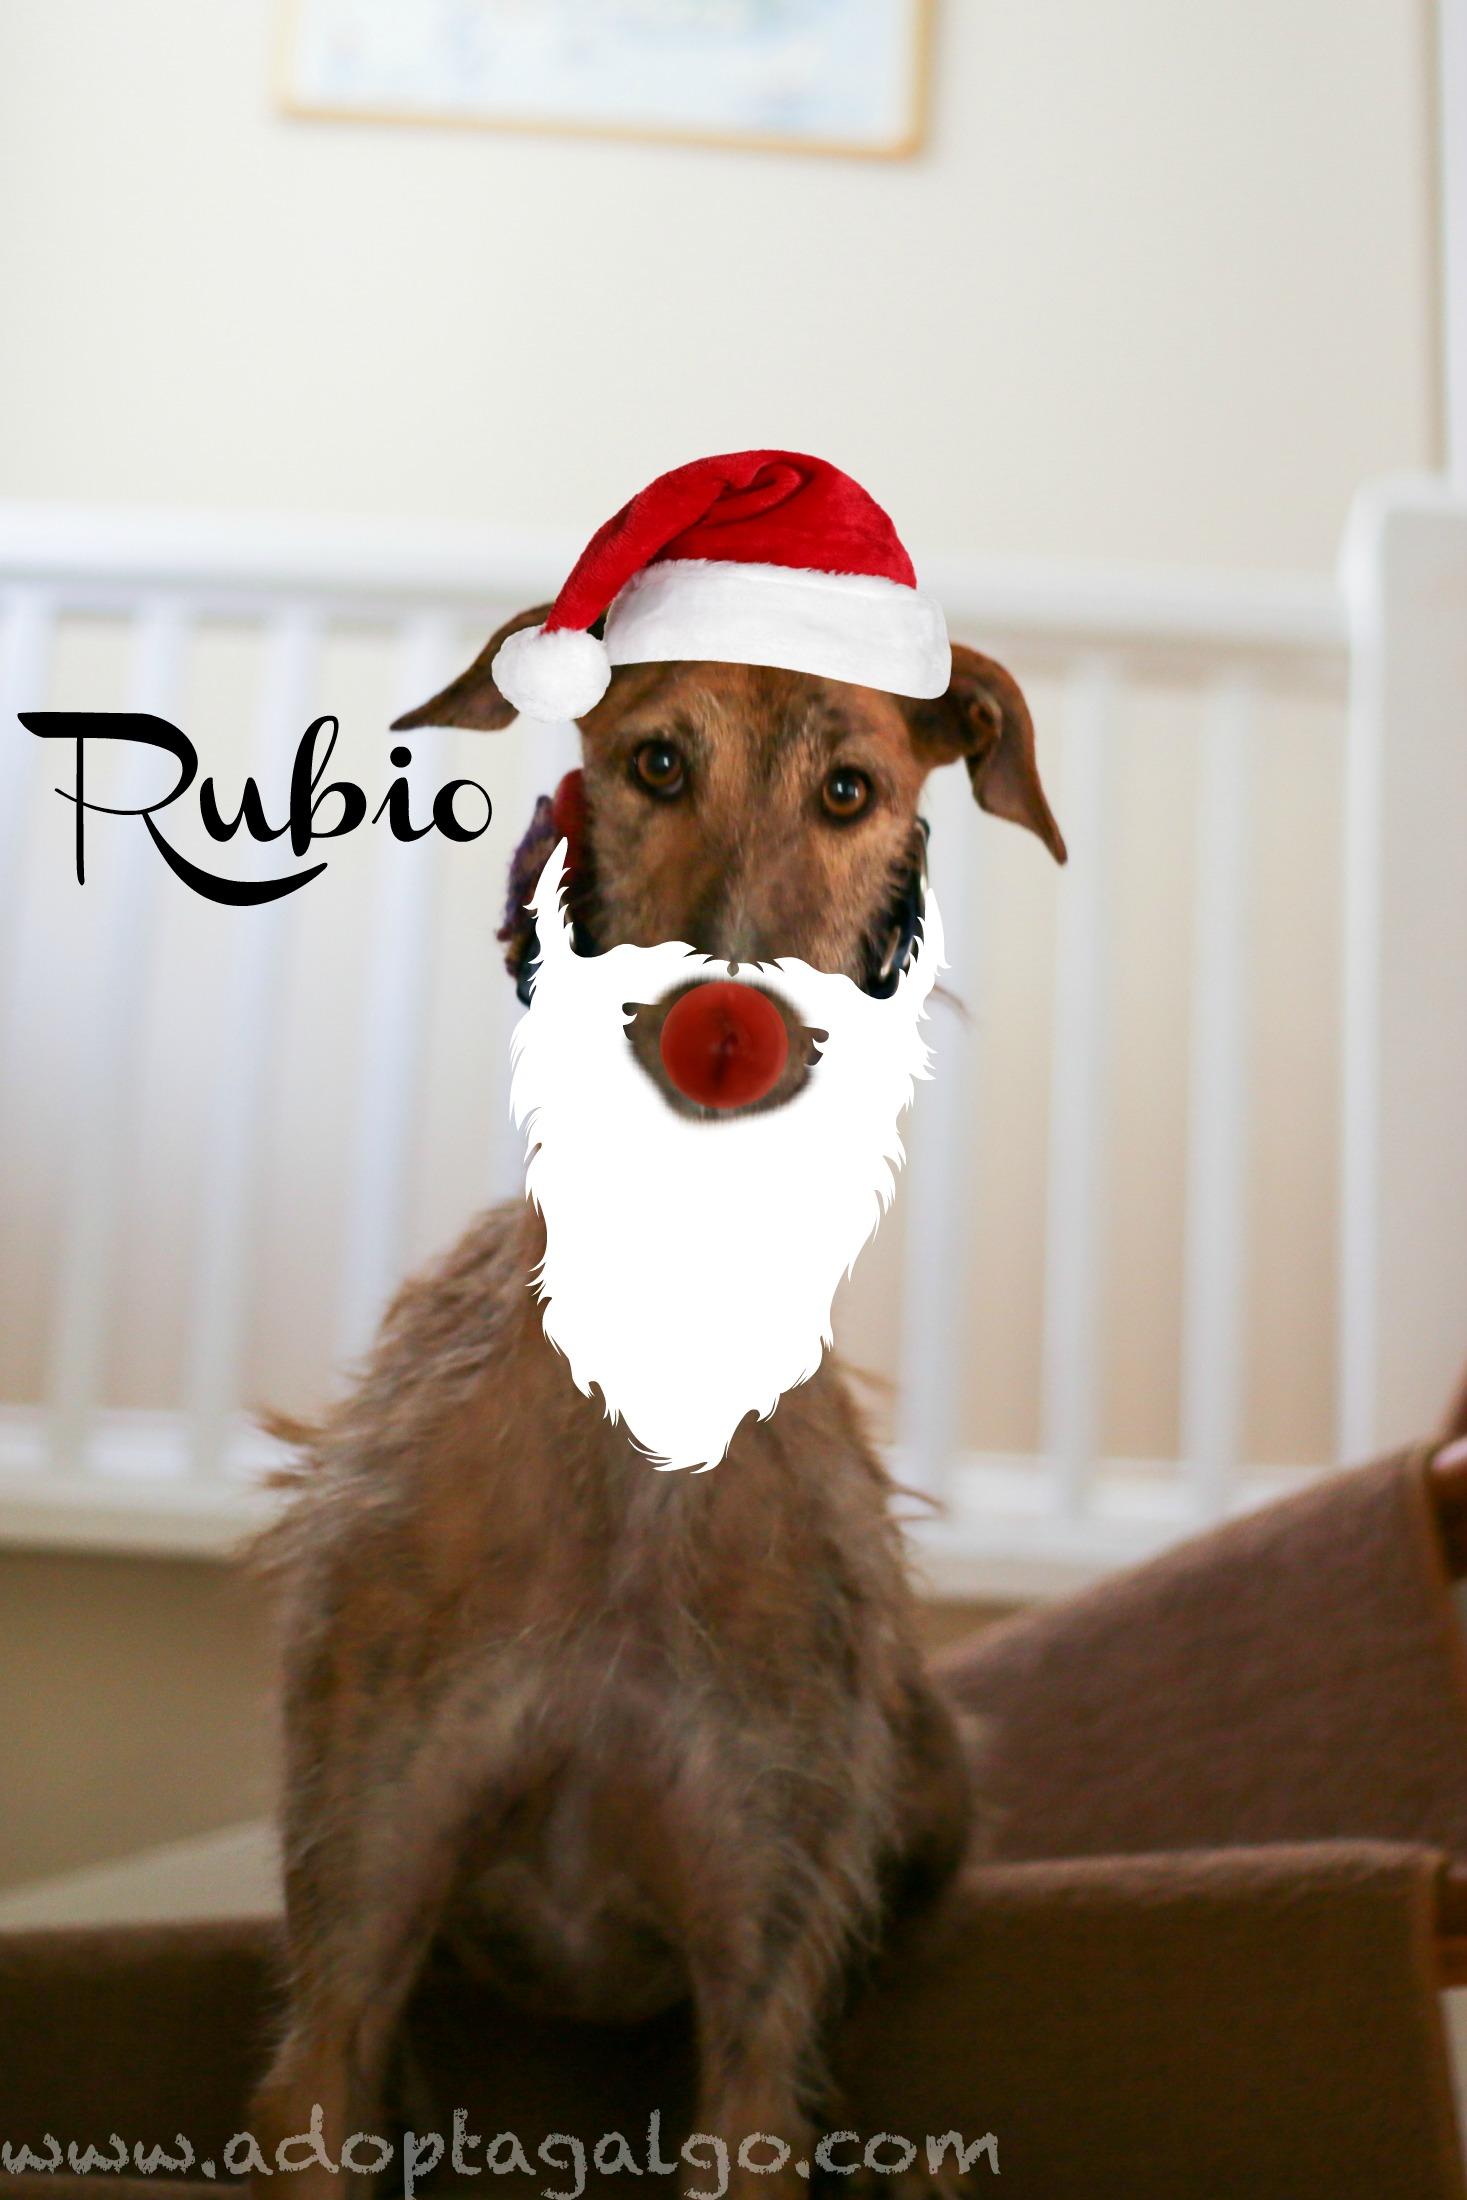 LHB-Rubio-Adopted.jpg